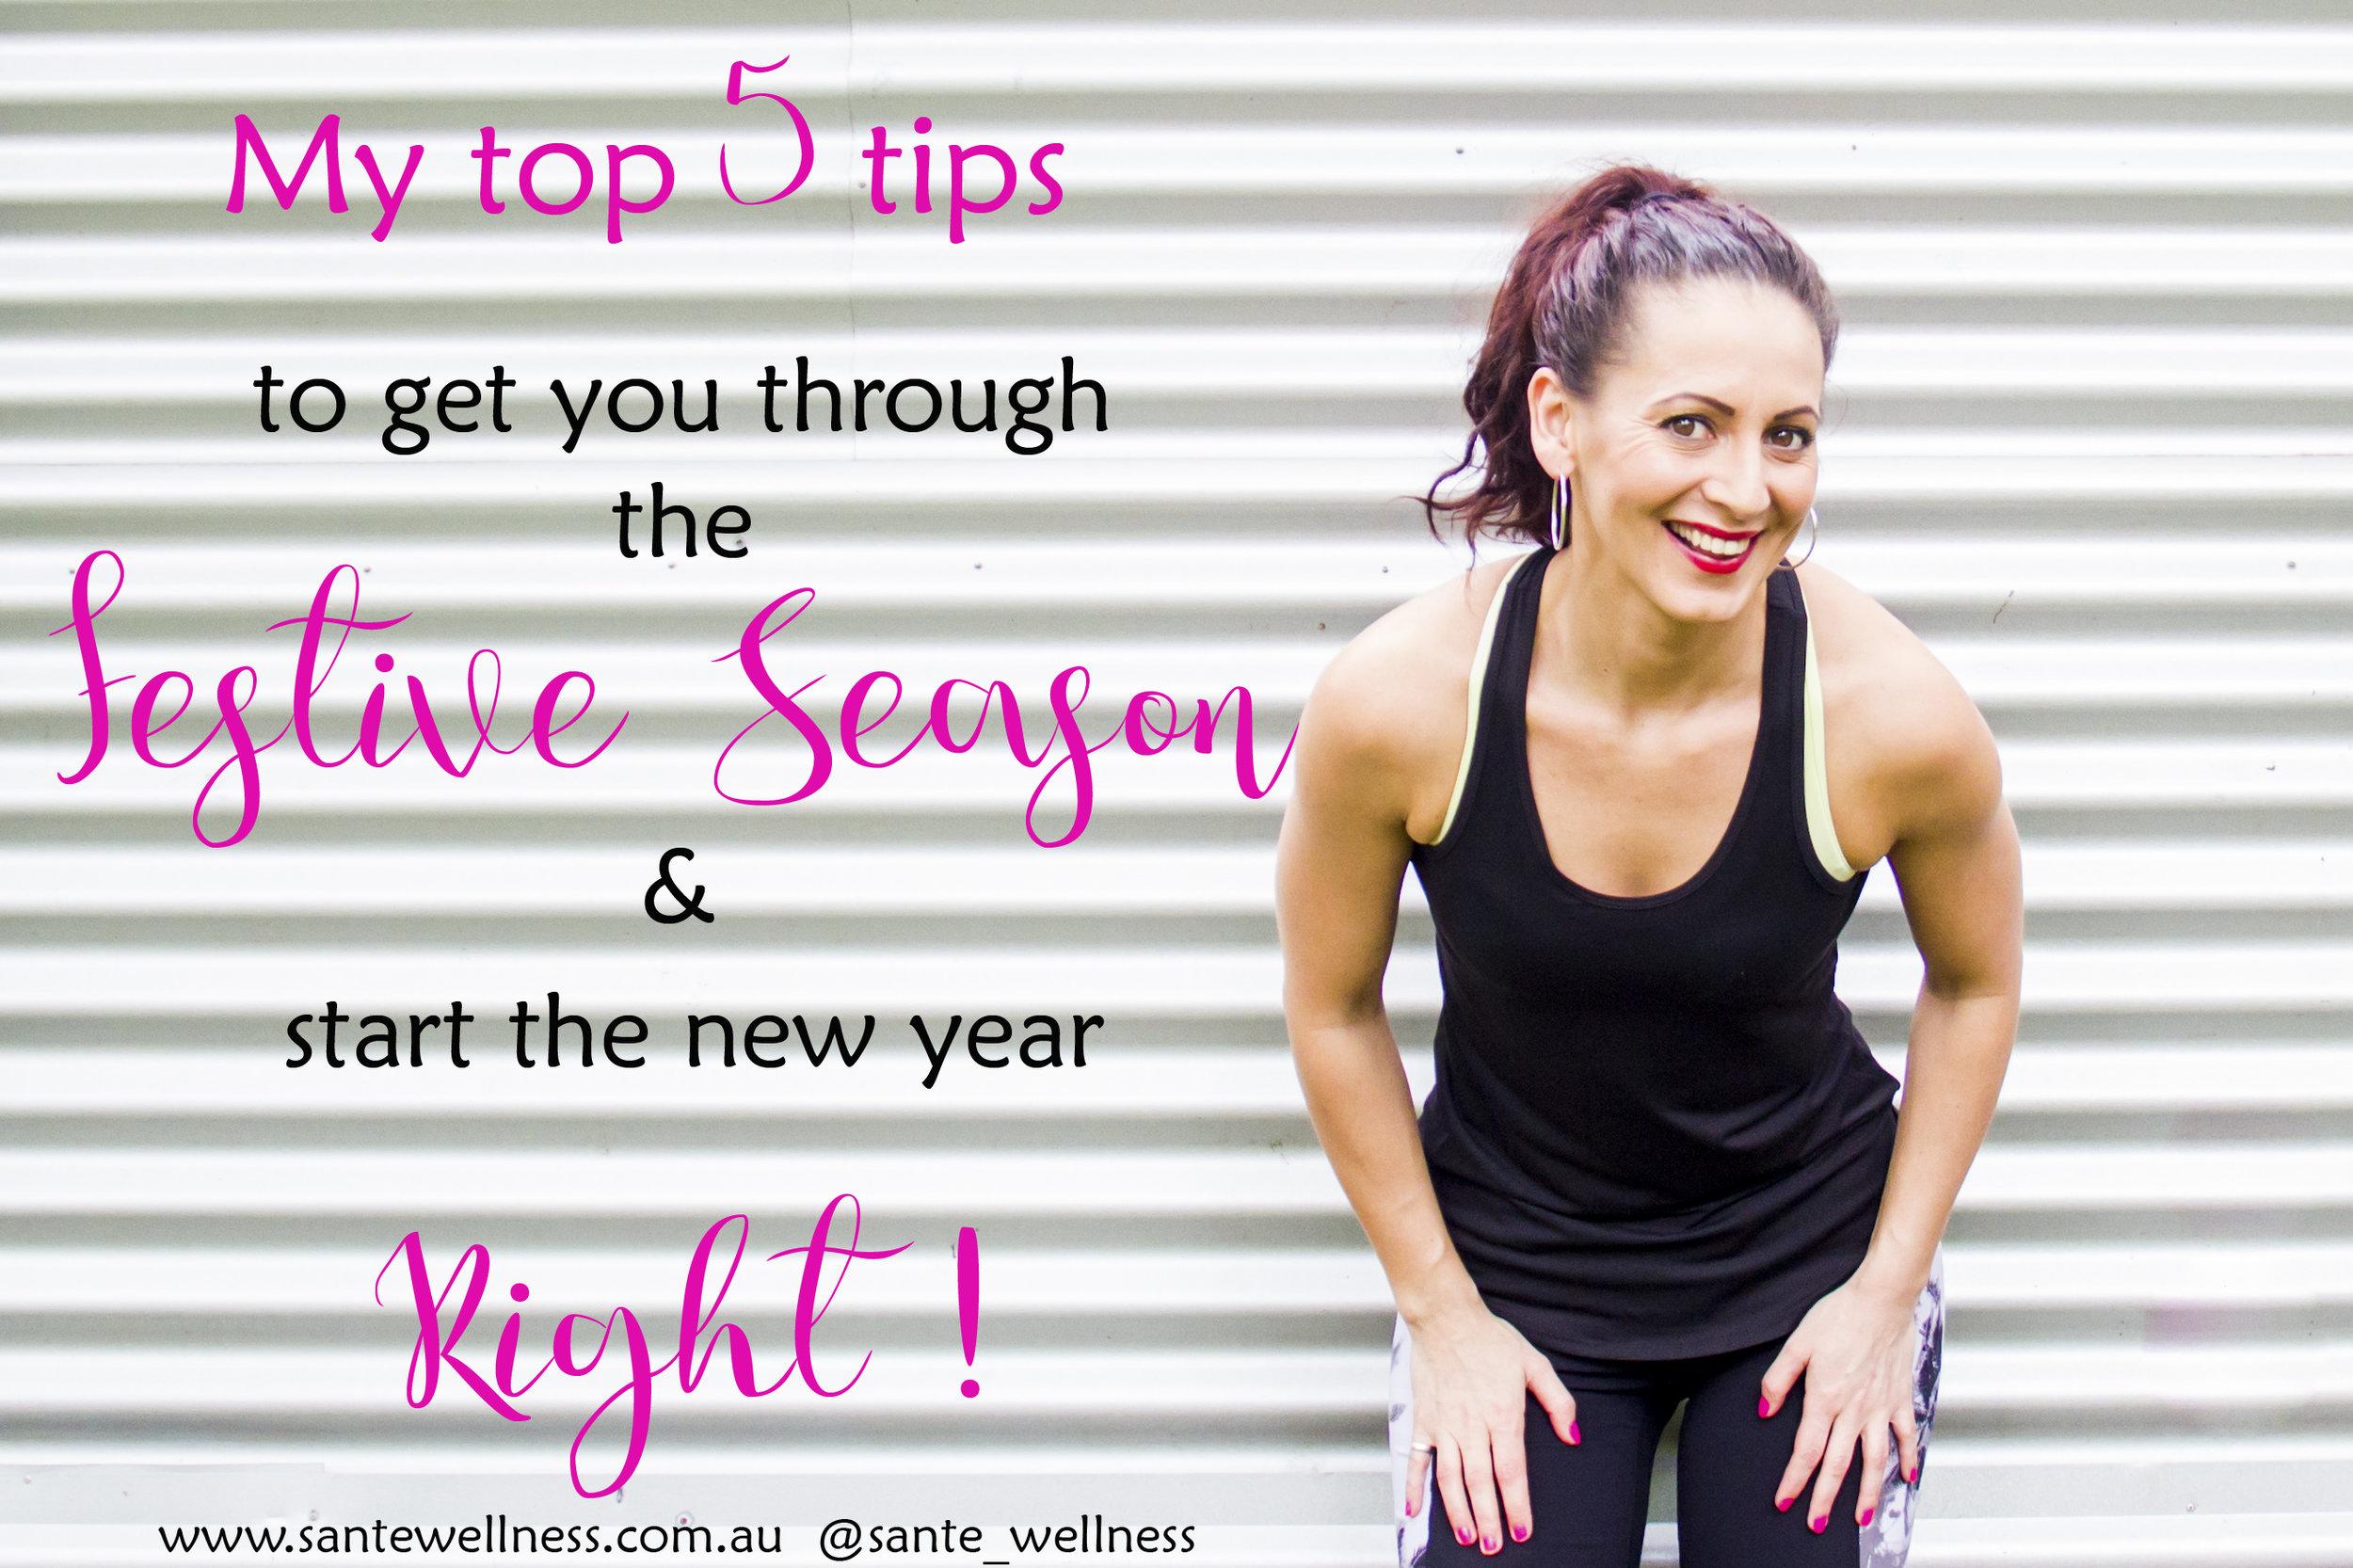 sante wellness festive season healthy